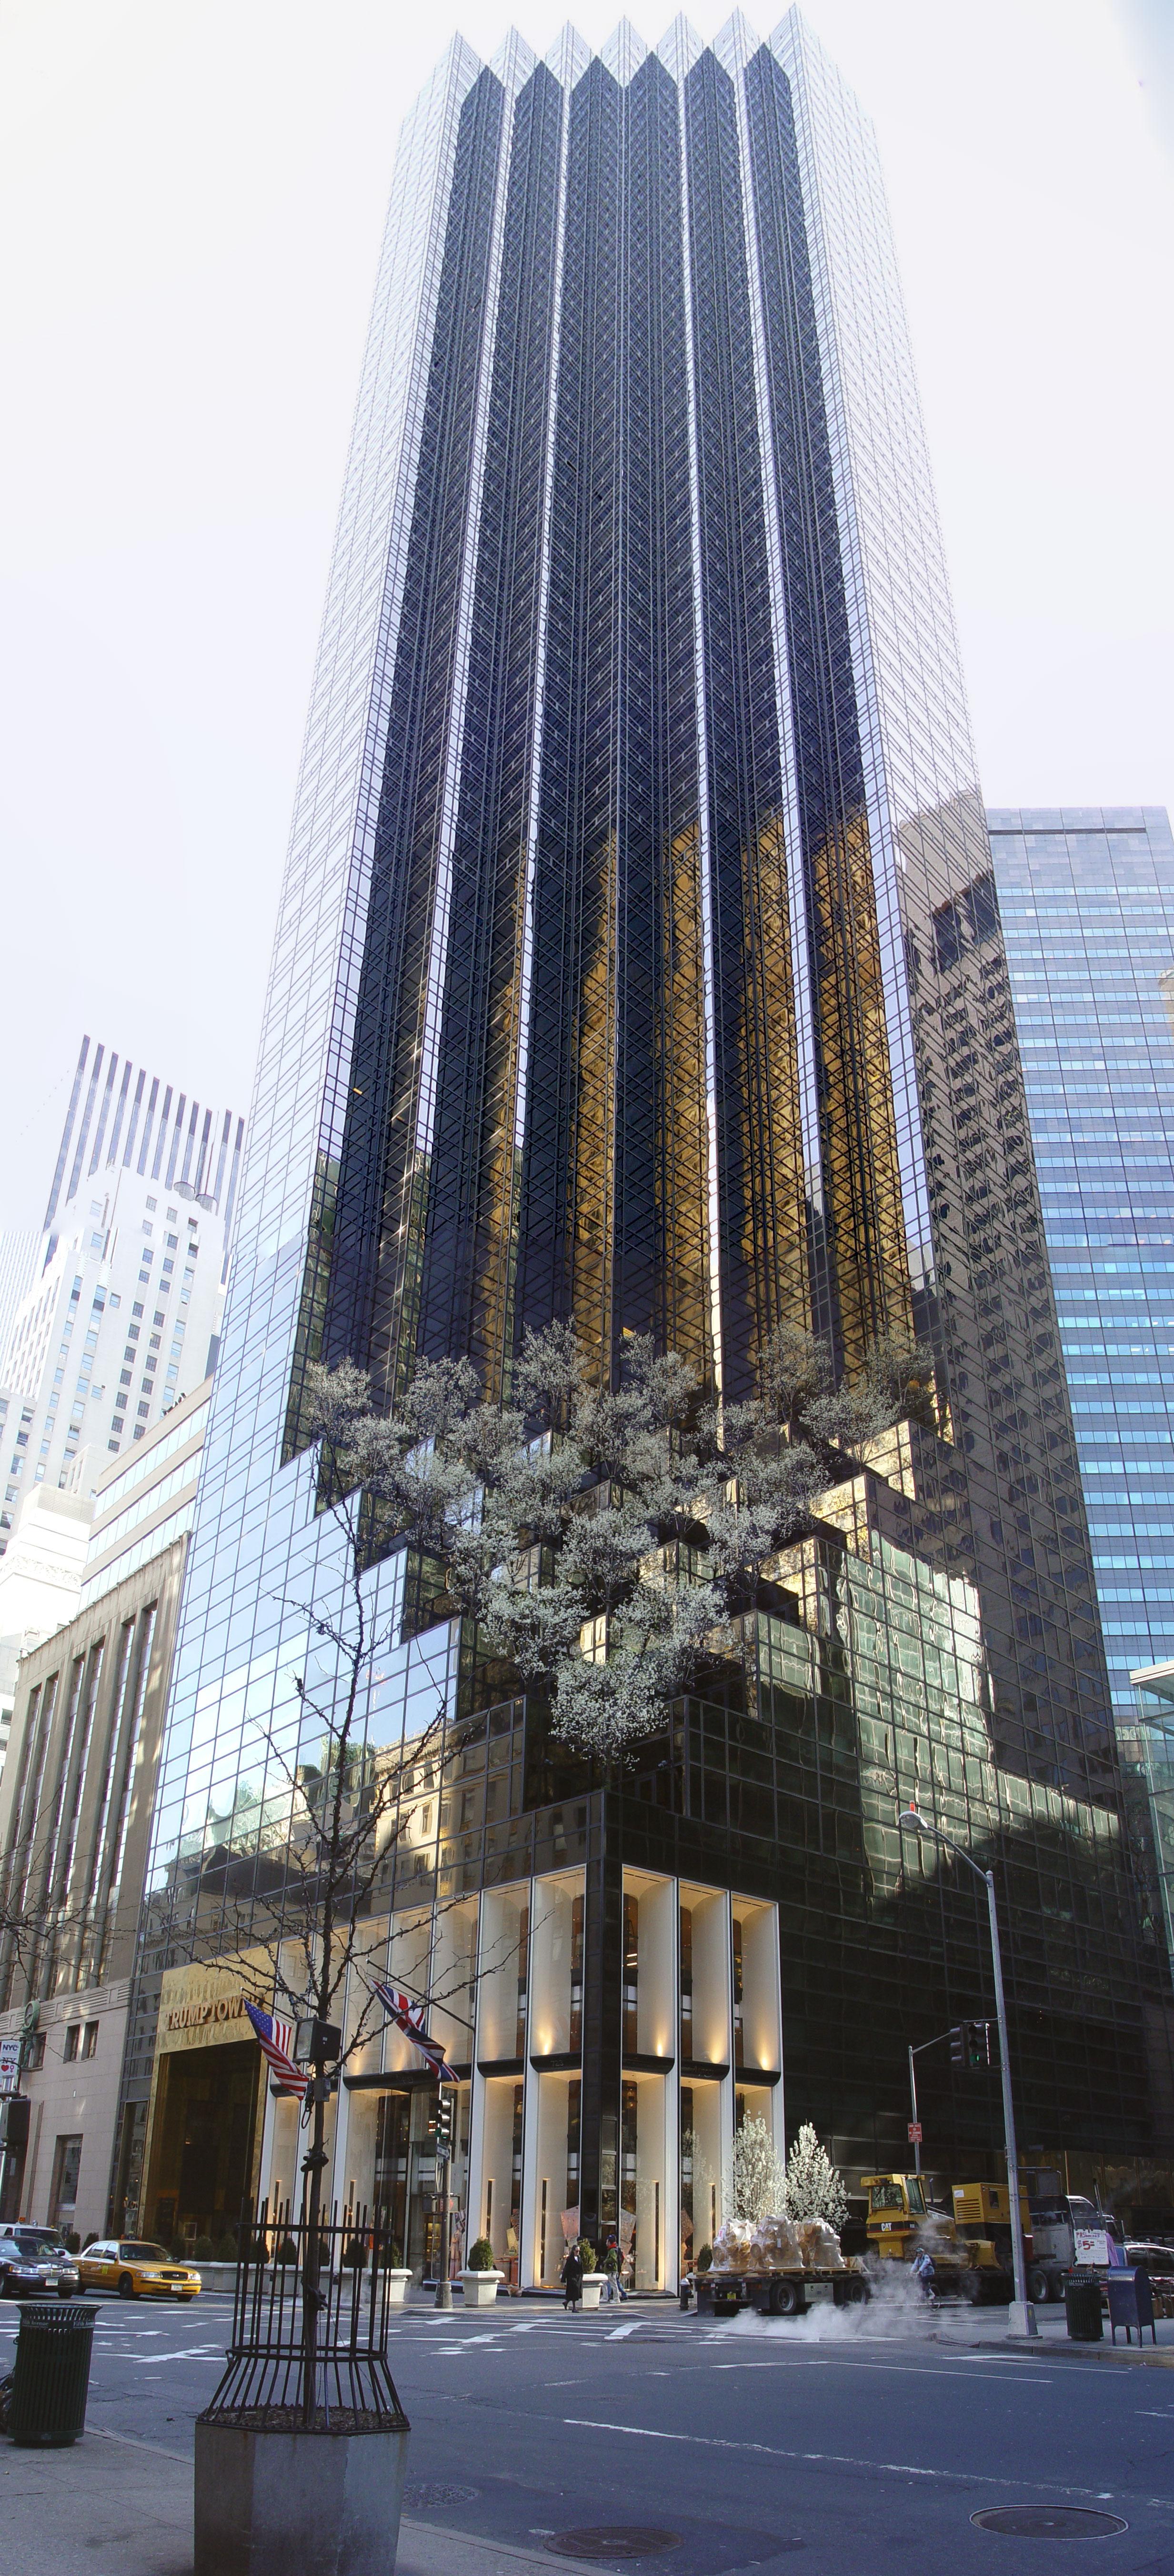 https://upload.wikimedia.org/wikipedia/commons/7/72/Trump-Tower-4.jpg